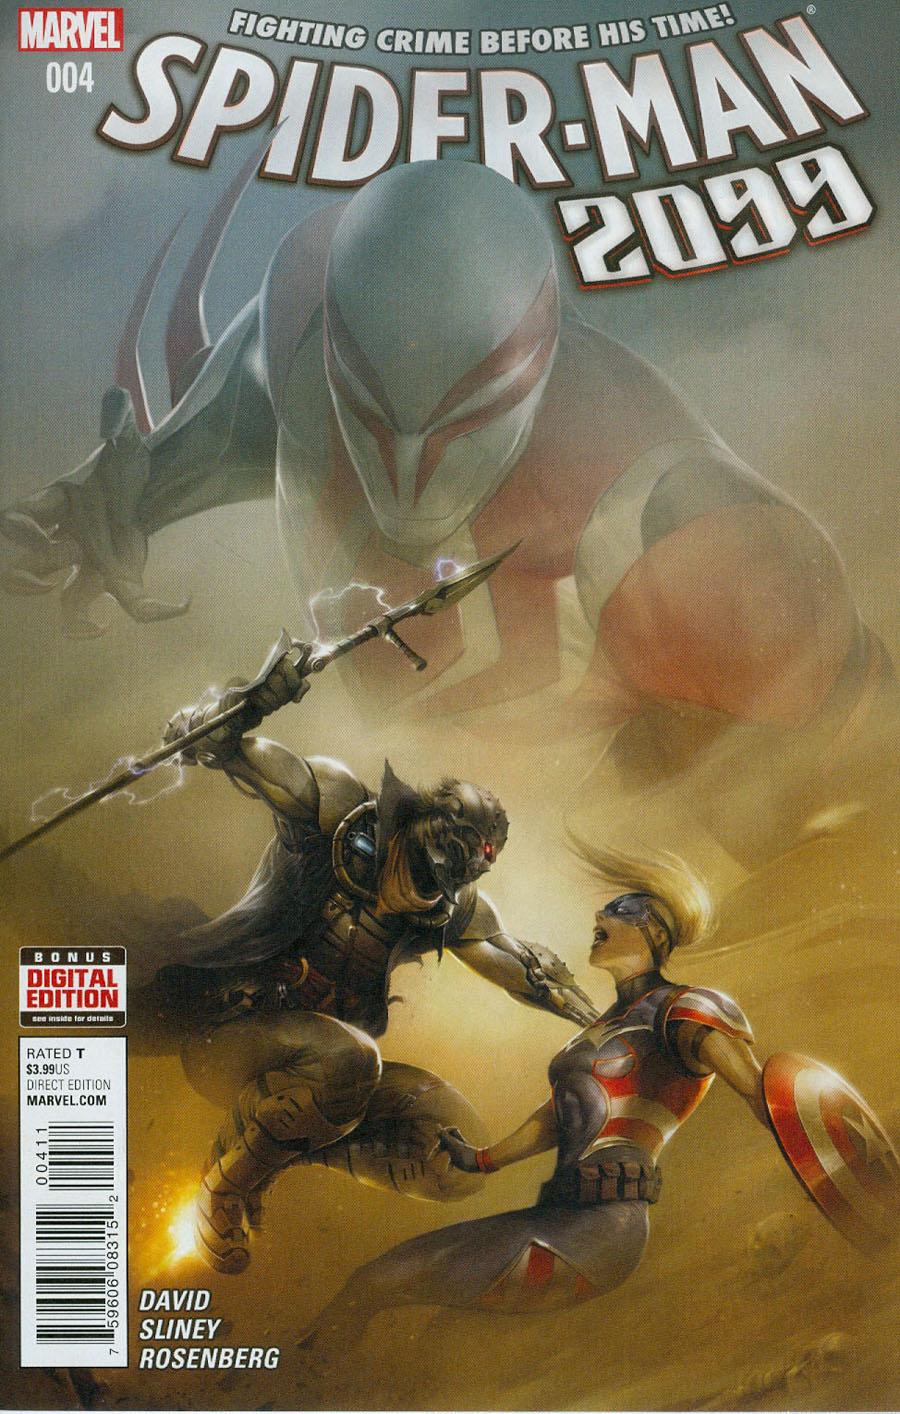 Spider-Man 2099 Vol 3 #4 Cover A Regular Francesco Mattina Cover